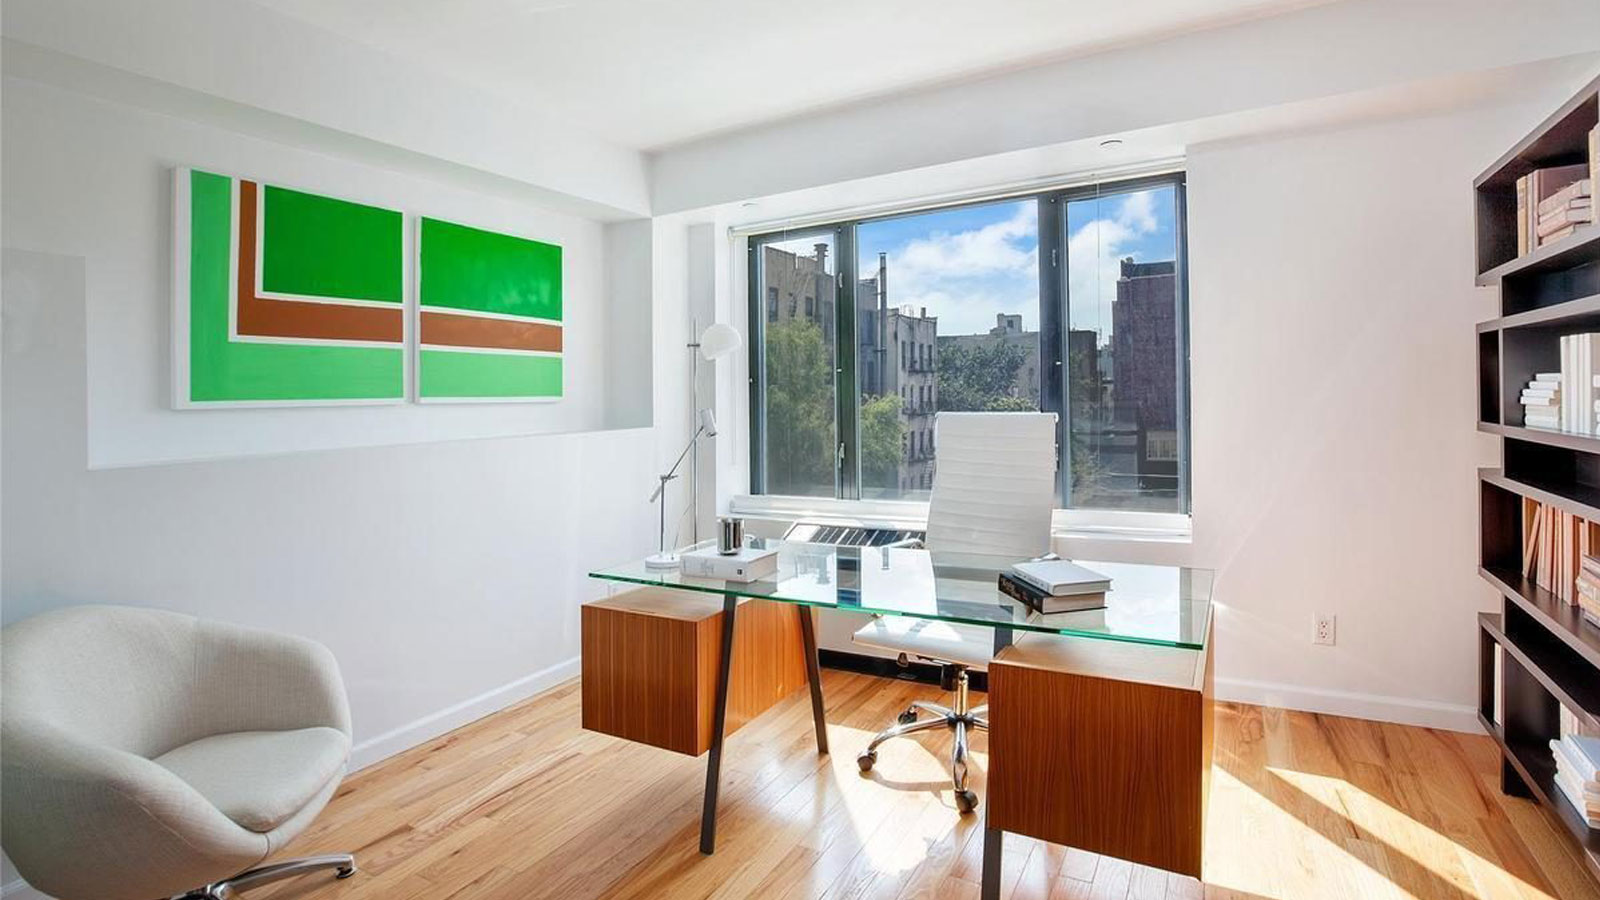 The Calyx, 189 Avenue C